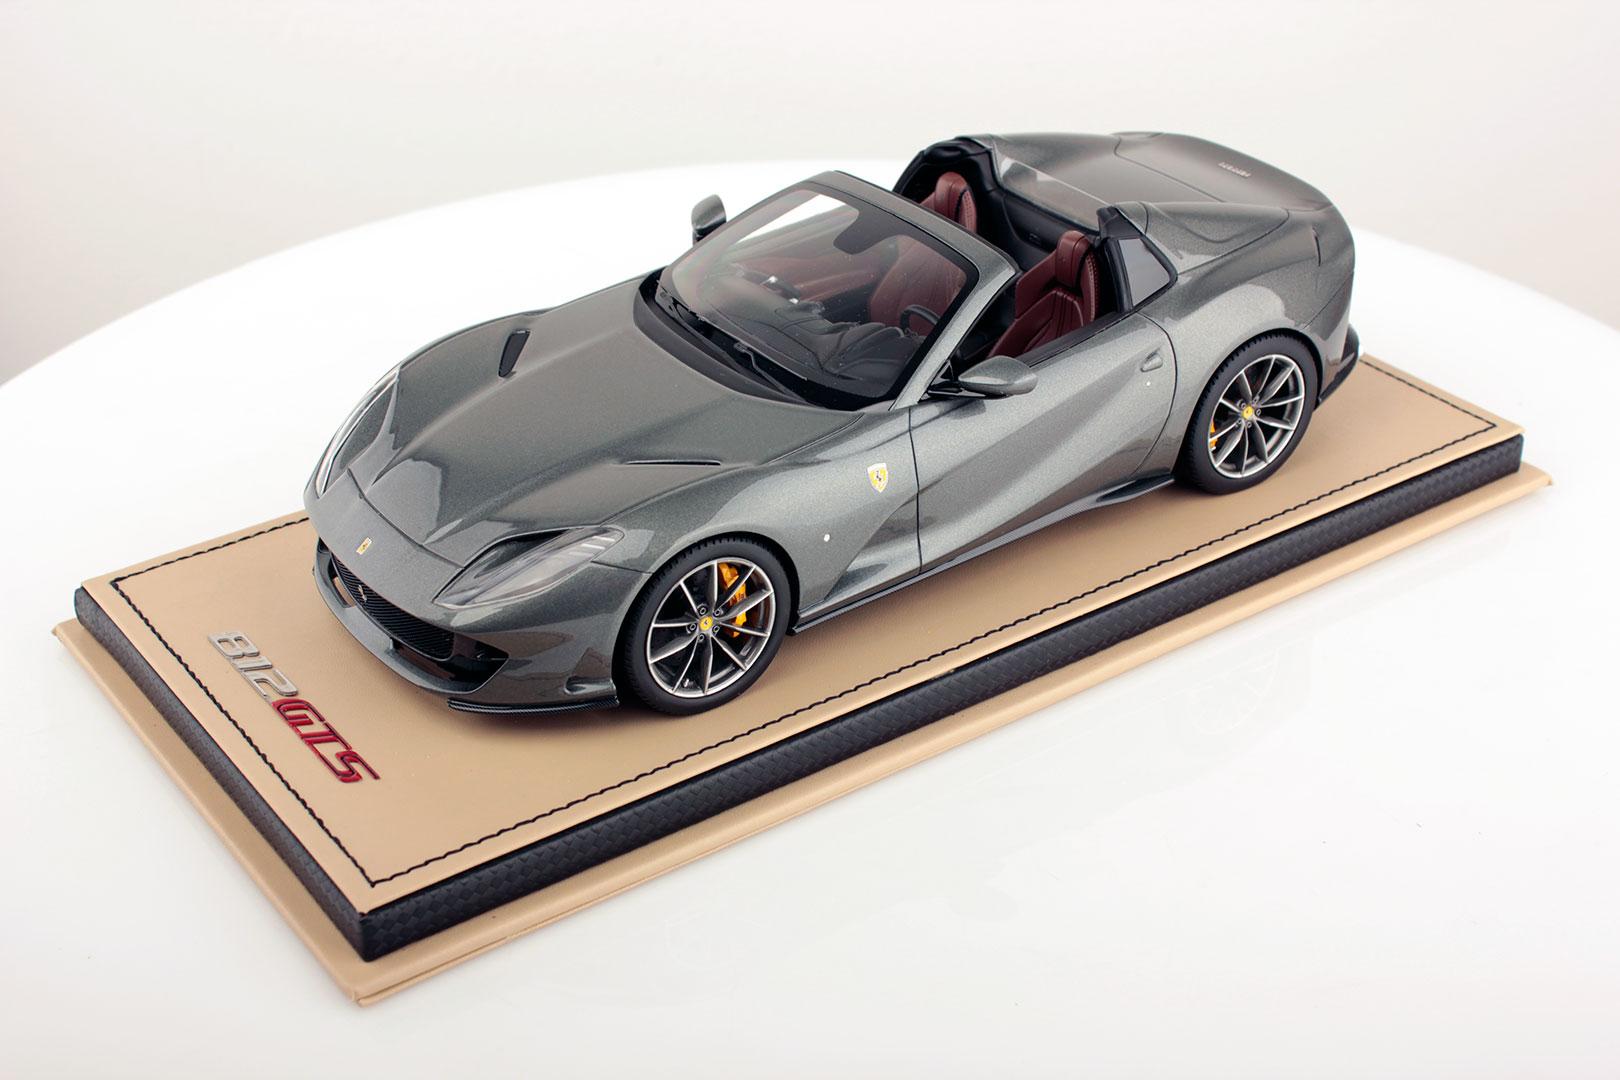 Ferrari 812 Gts 1 18 Mr Collection Models